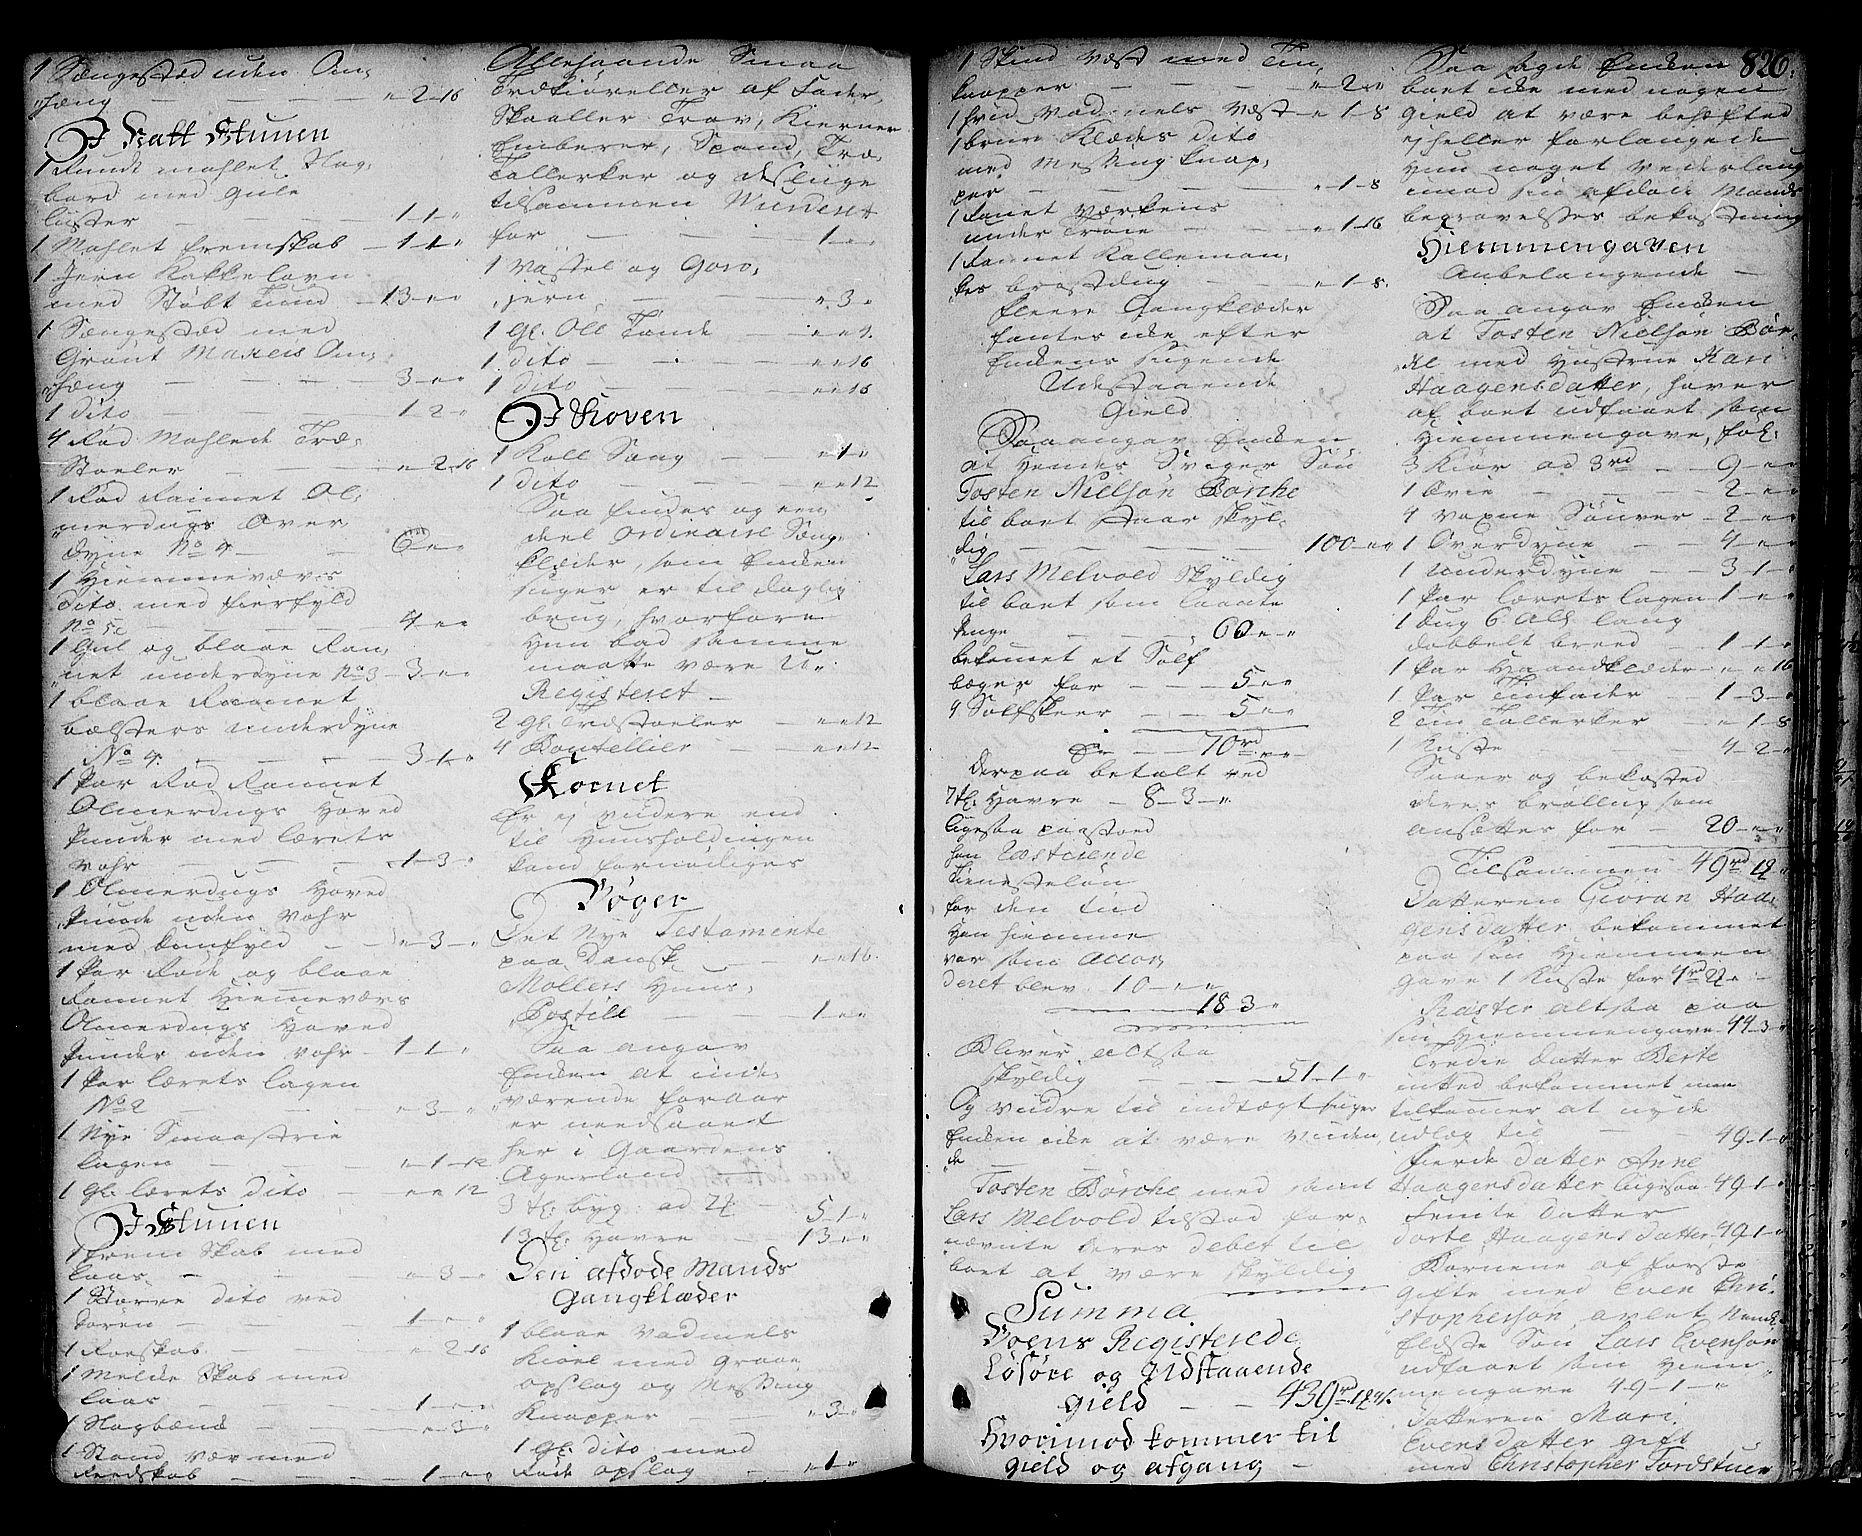 SAO, Nedre Romerike sorenskriveri, H/Hd/Hda/L0007a: Skifteprotokoll, 1747-1753, s. 825b-826a